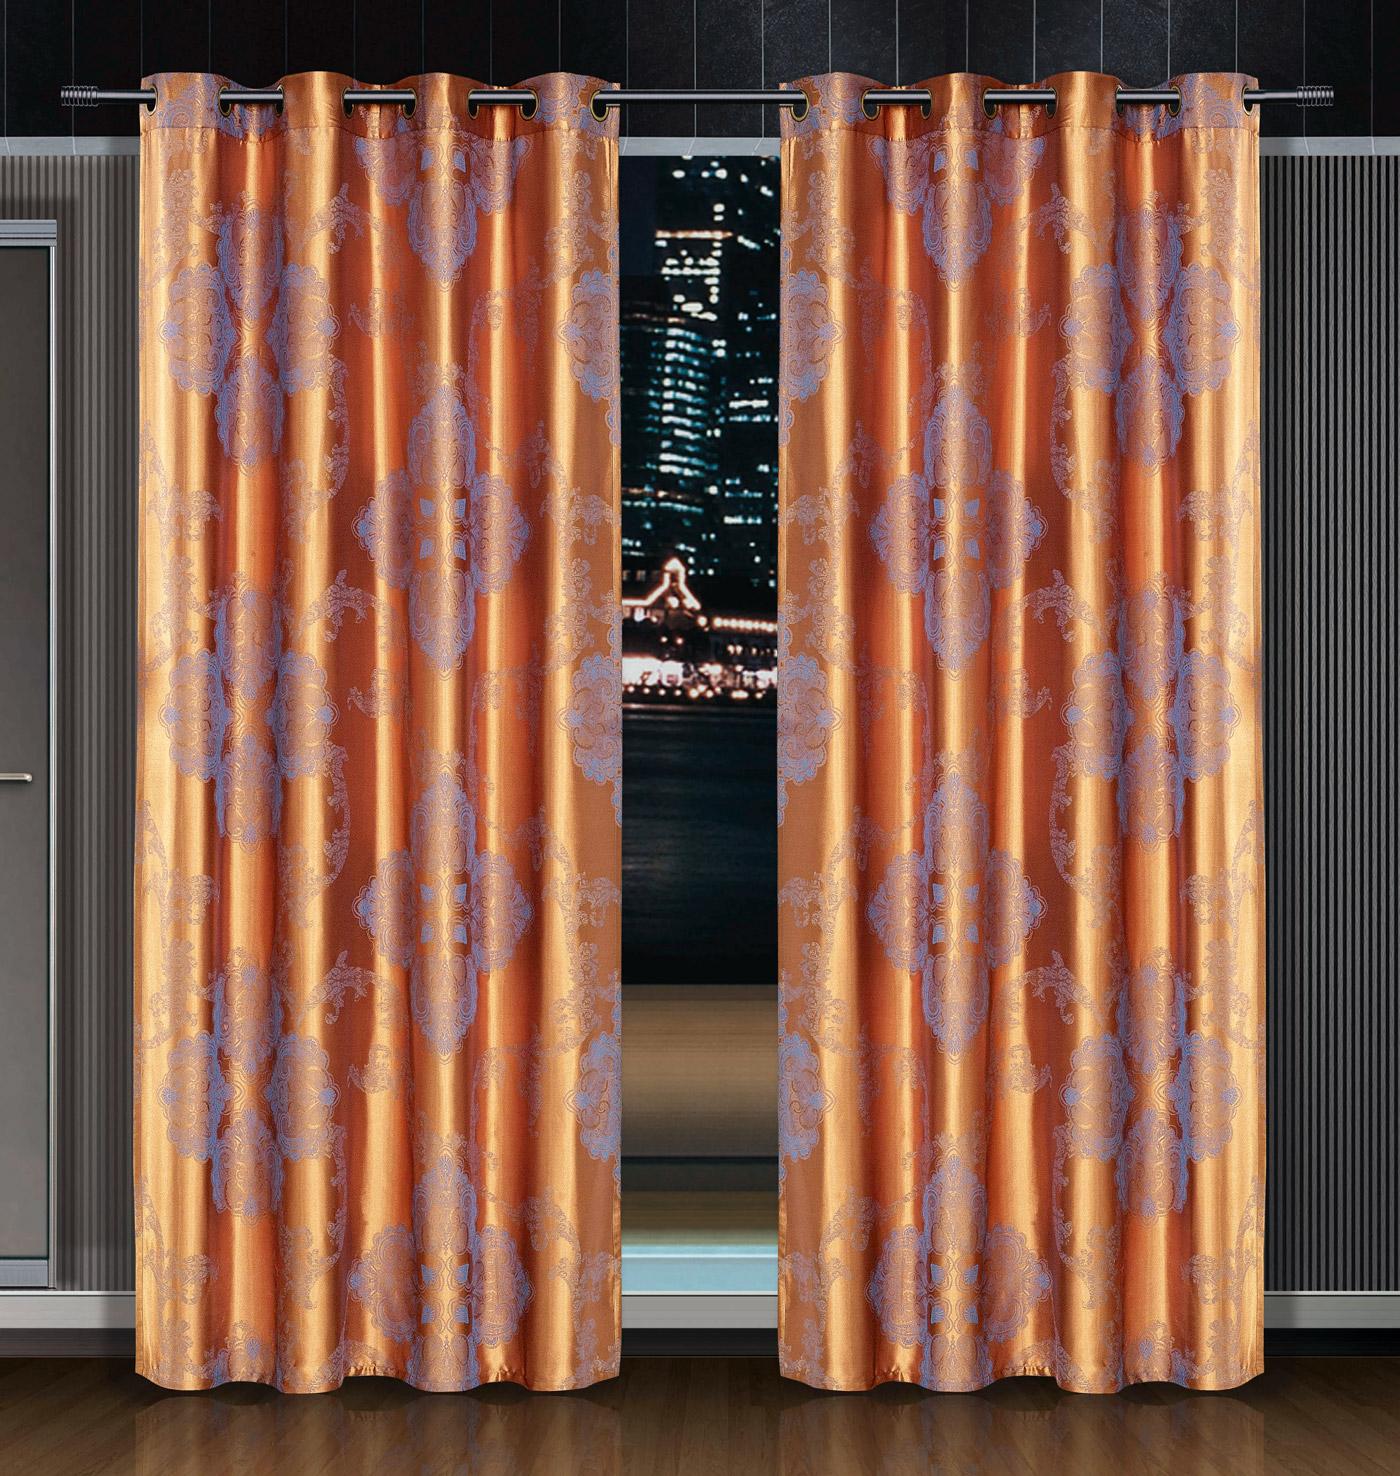 467-Freya-Dolce-Mela-Window-Treatments-Drapes-Curtain-Panel.jpg